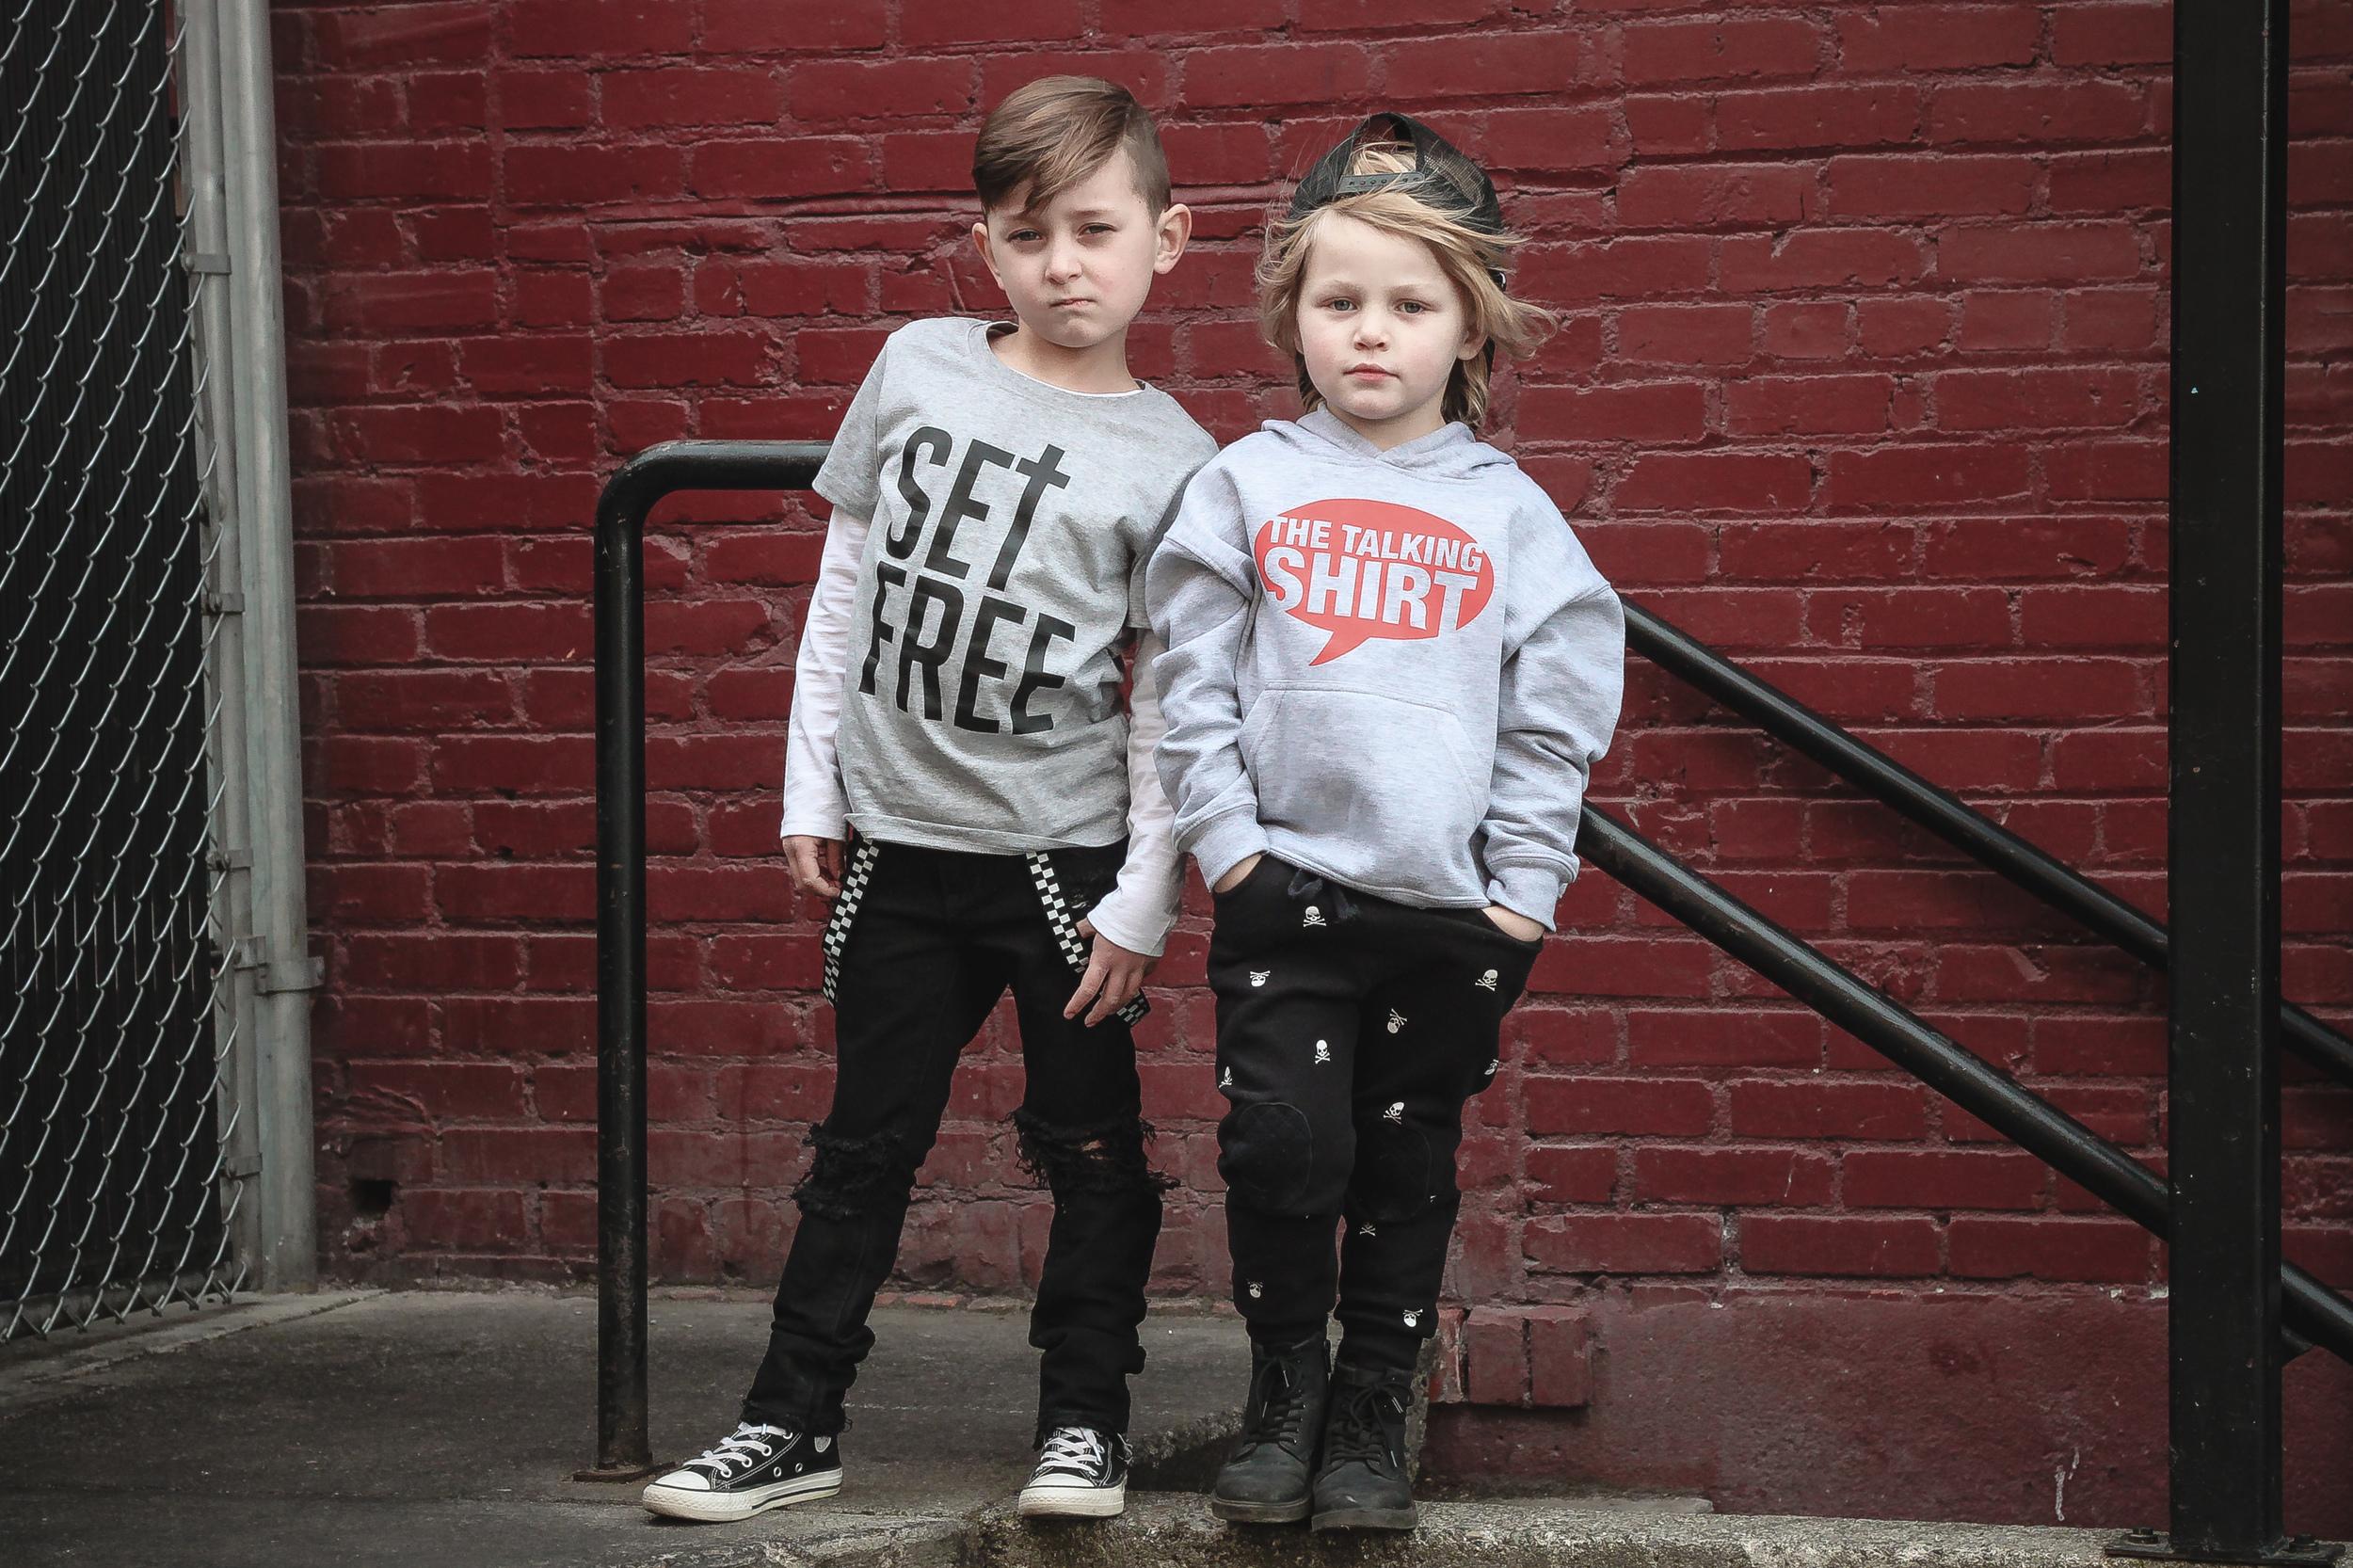 The Talking Shirt by Phoenix Street